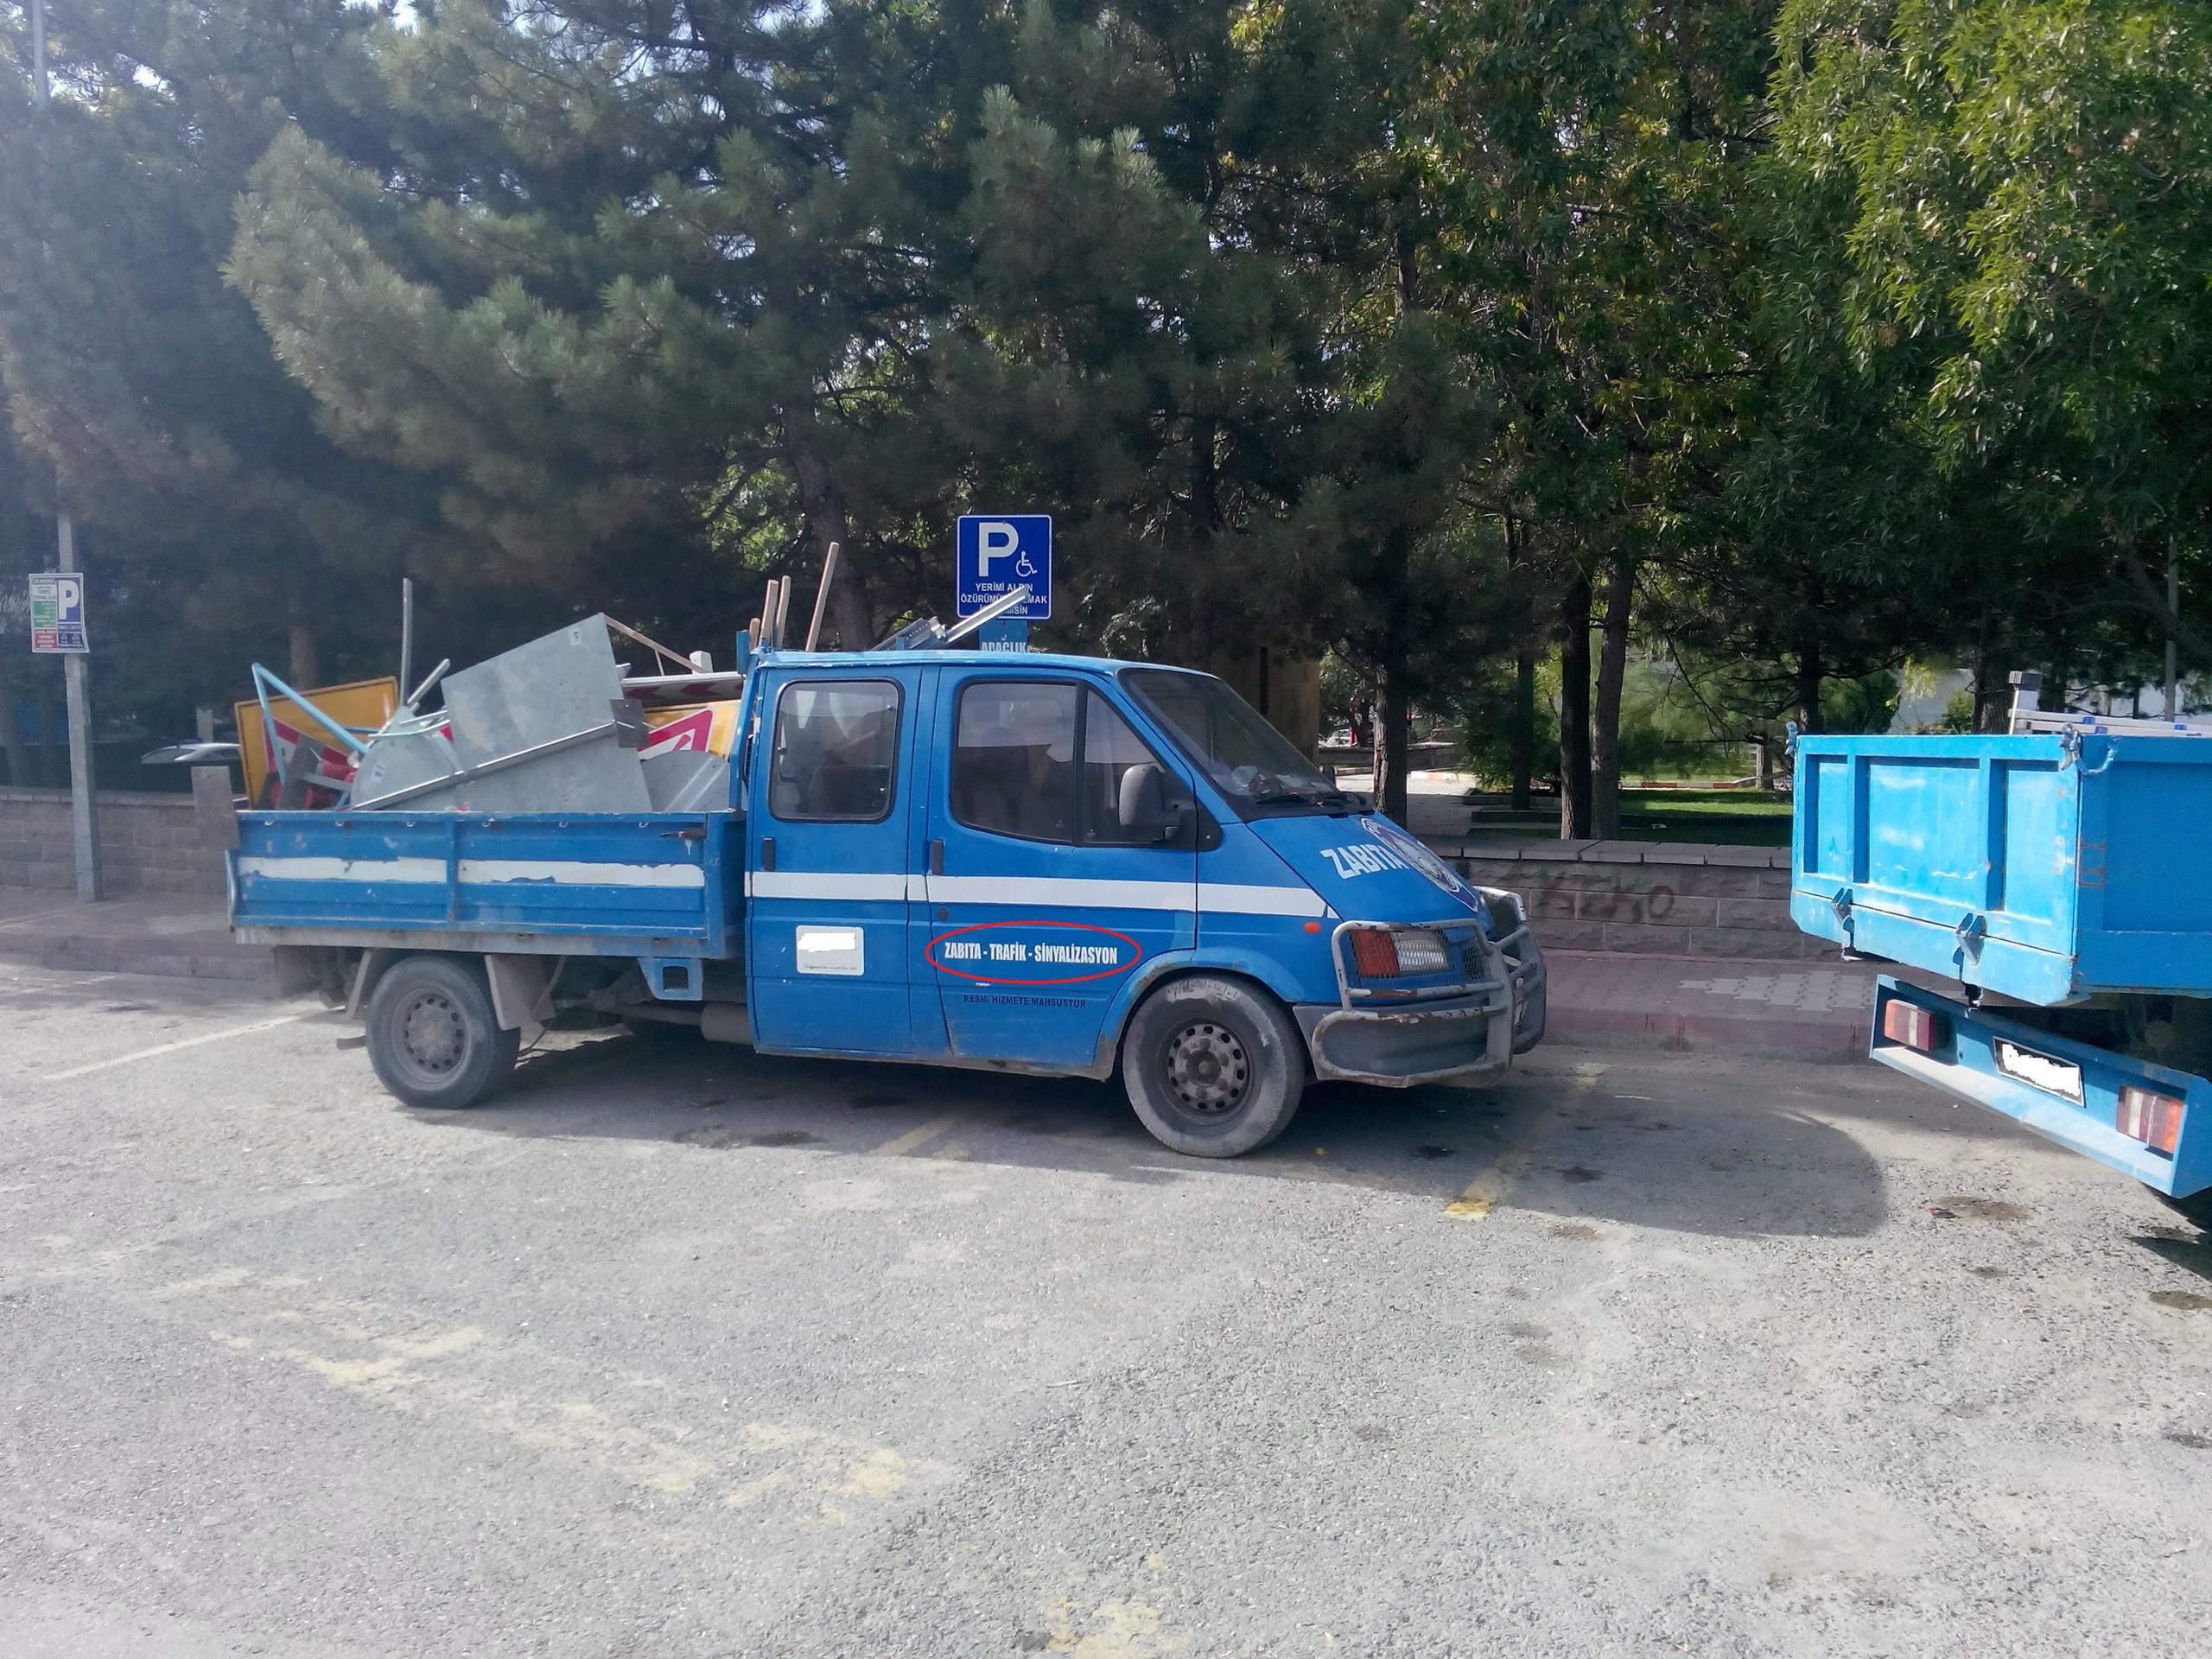 Xoaqr5 - Engelli park yeri mi; o da ne?